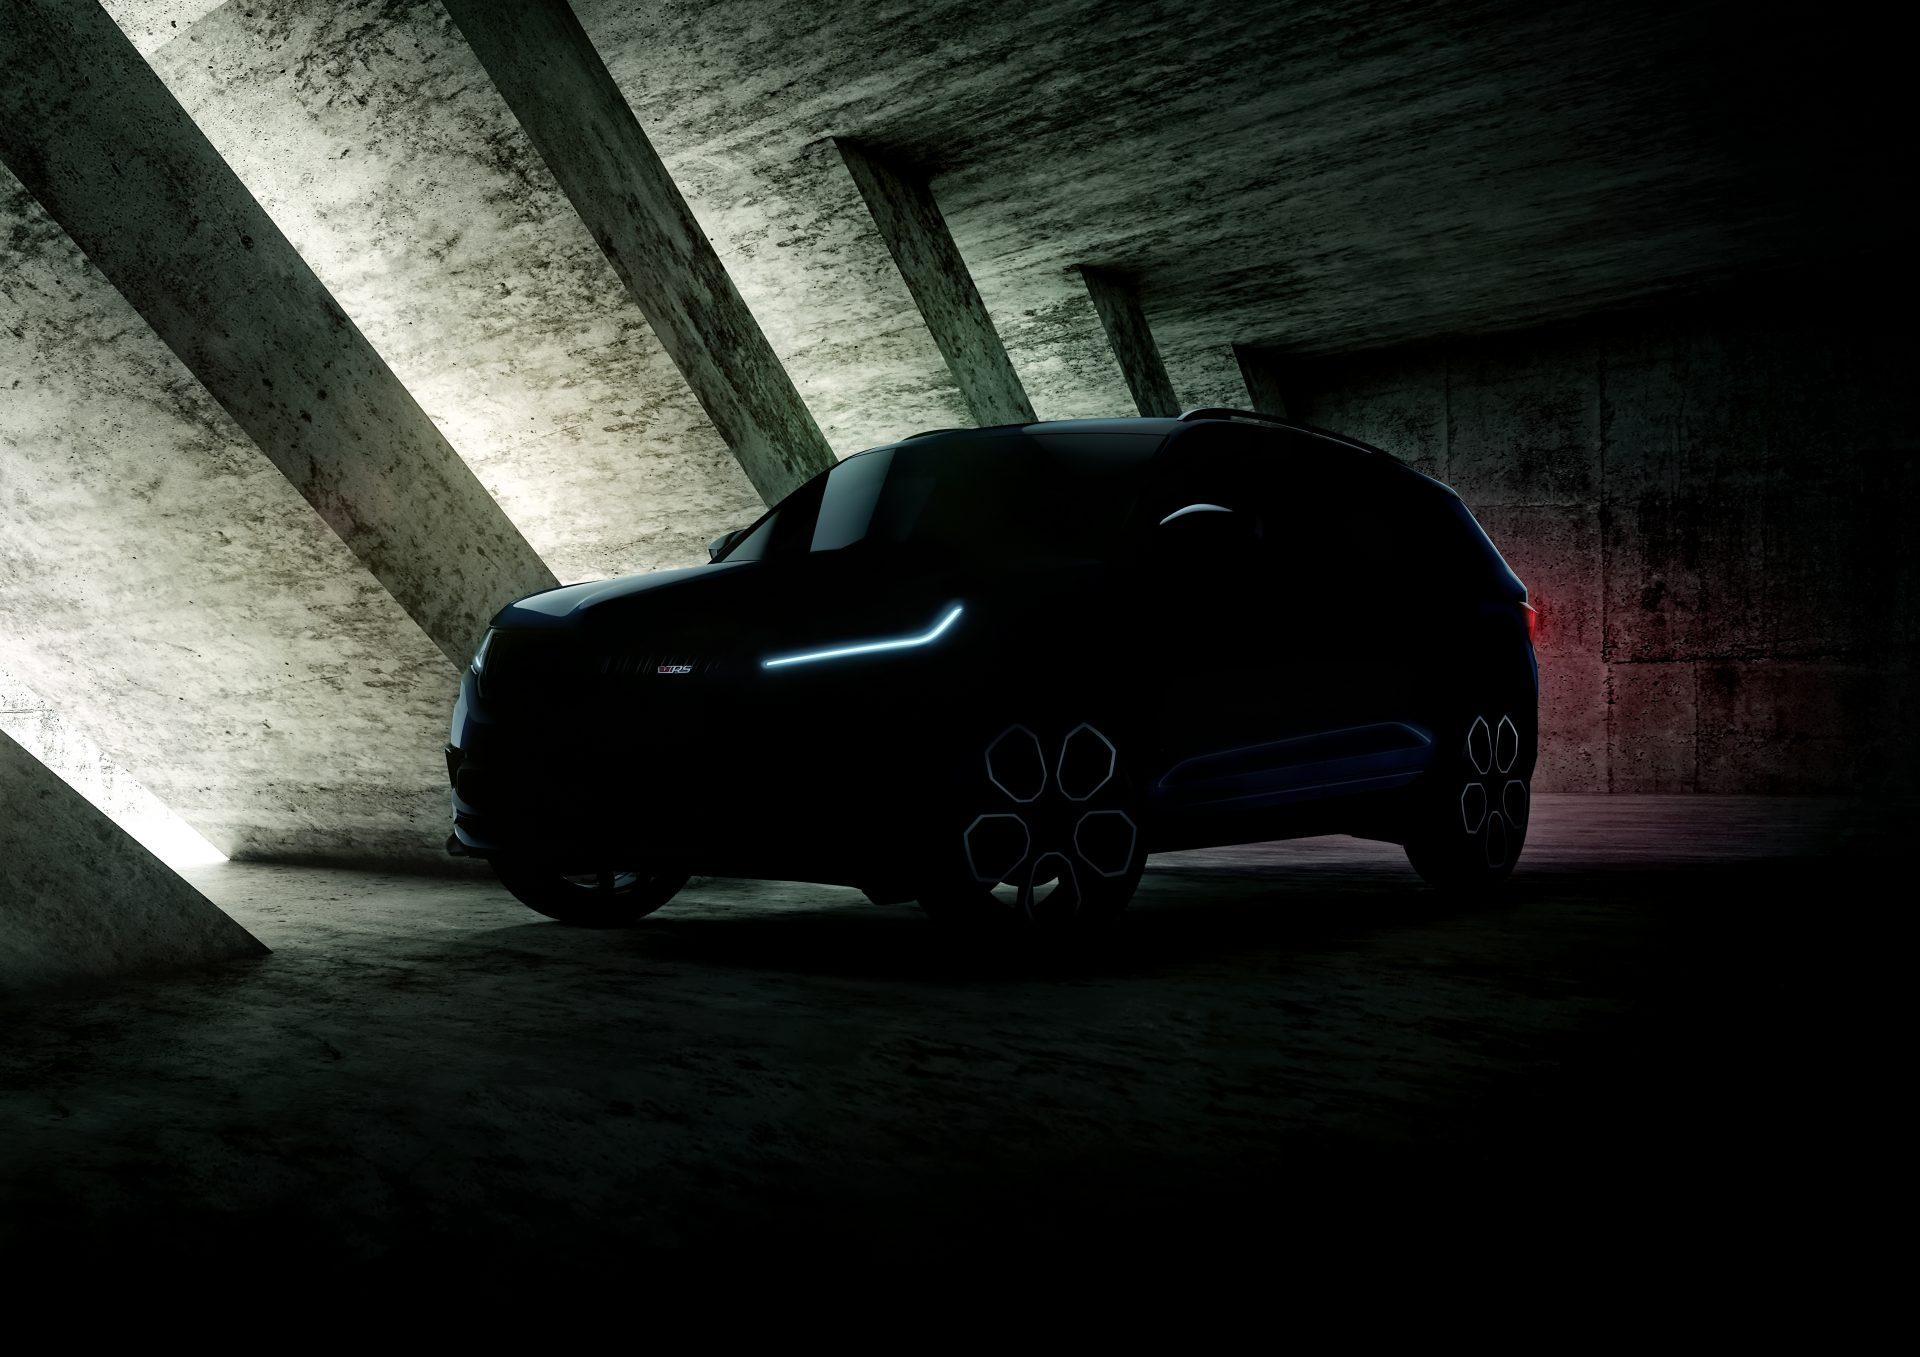 Hyundai Kona Pe Unde O Ia Suv Ul Mic Auto Bild Ro >> Stiri In Ziarul Autobild Www Infoziare Ro